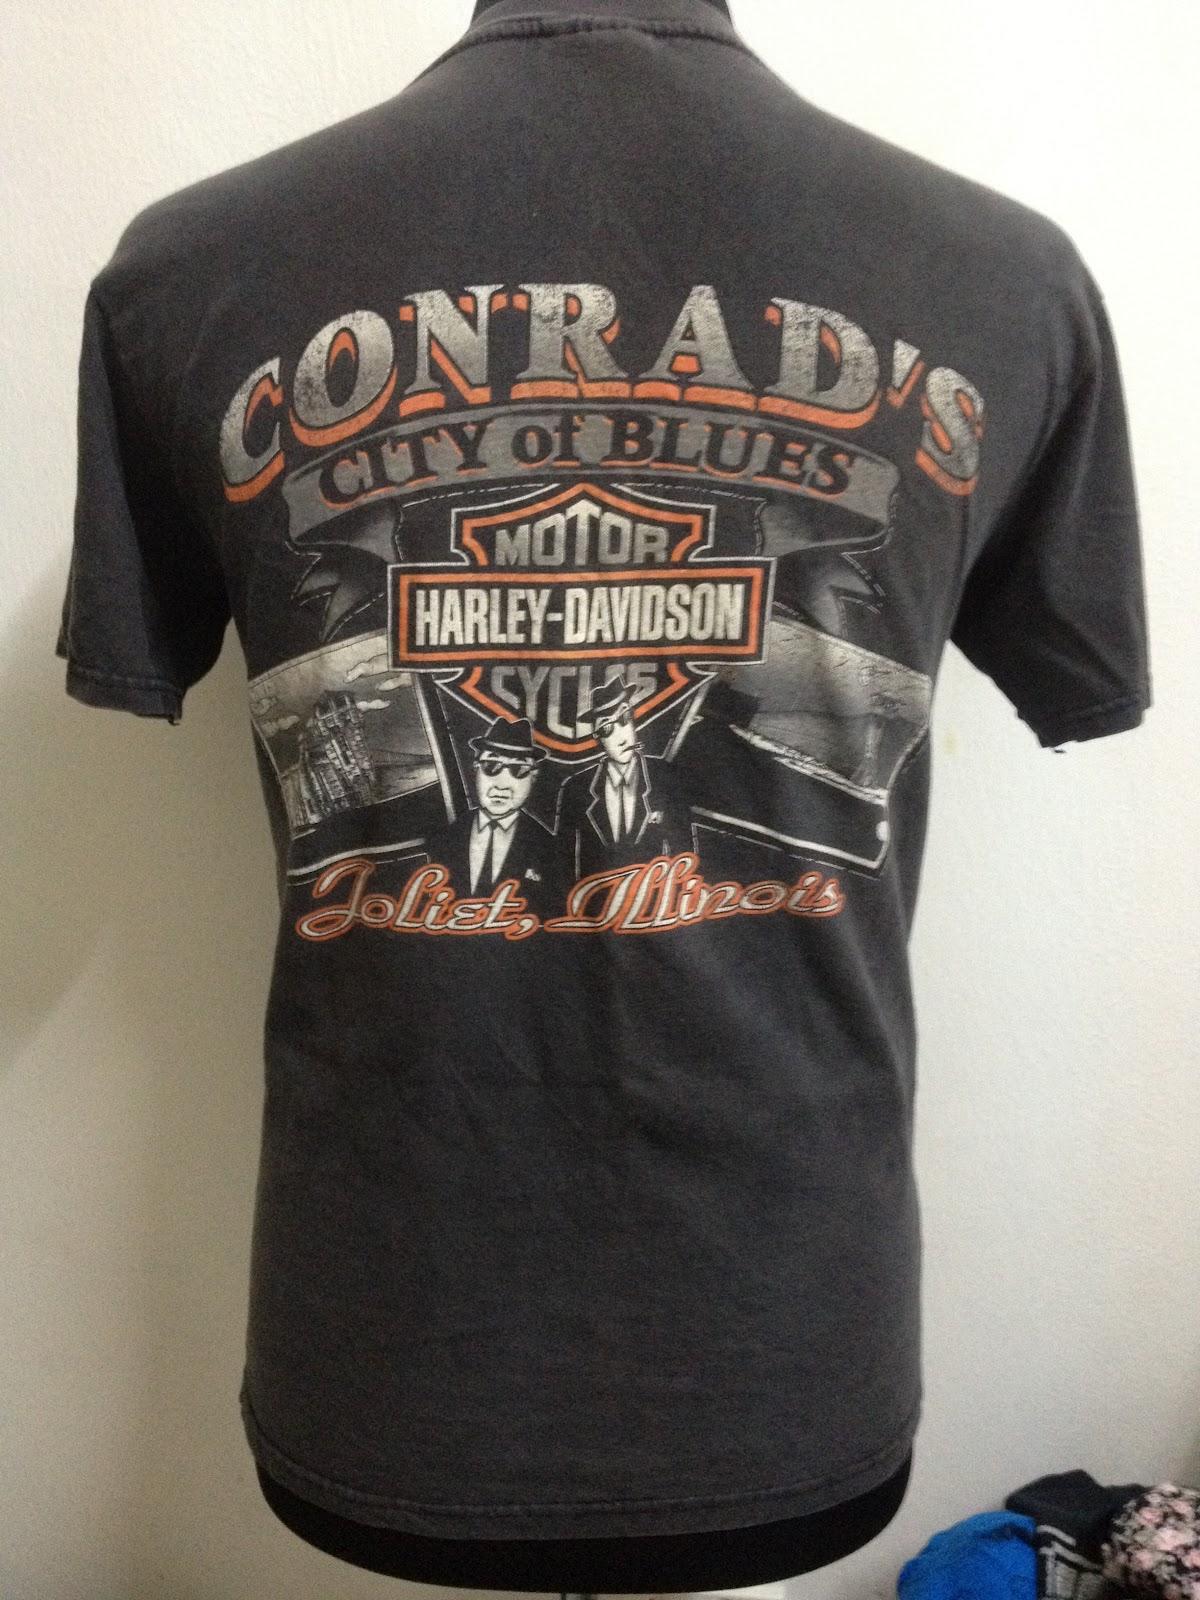 "Conrads Harley Davidson >> Bizar Bundle: [SOLD]HARLEY CONRAD'S ""city of blues"" t-shirt"